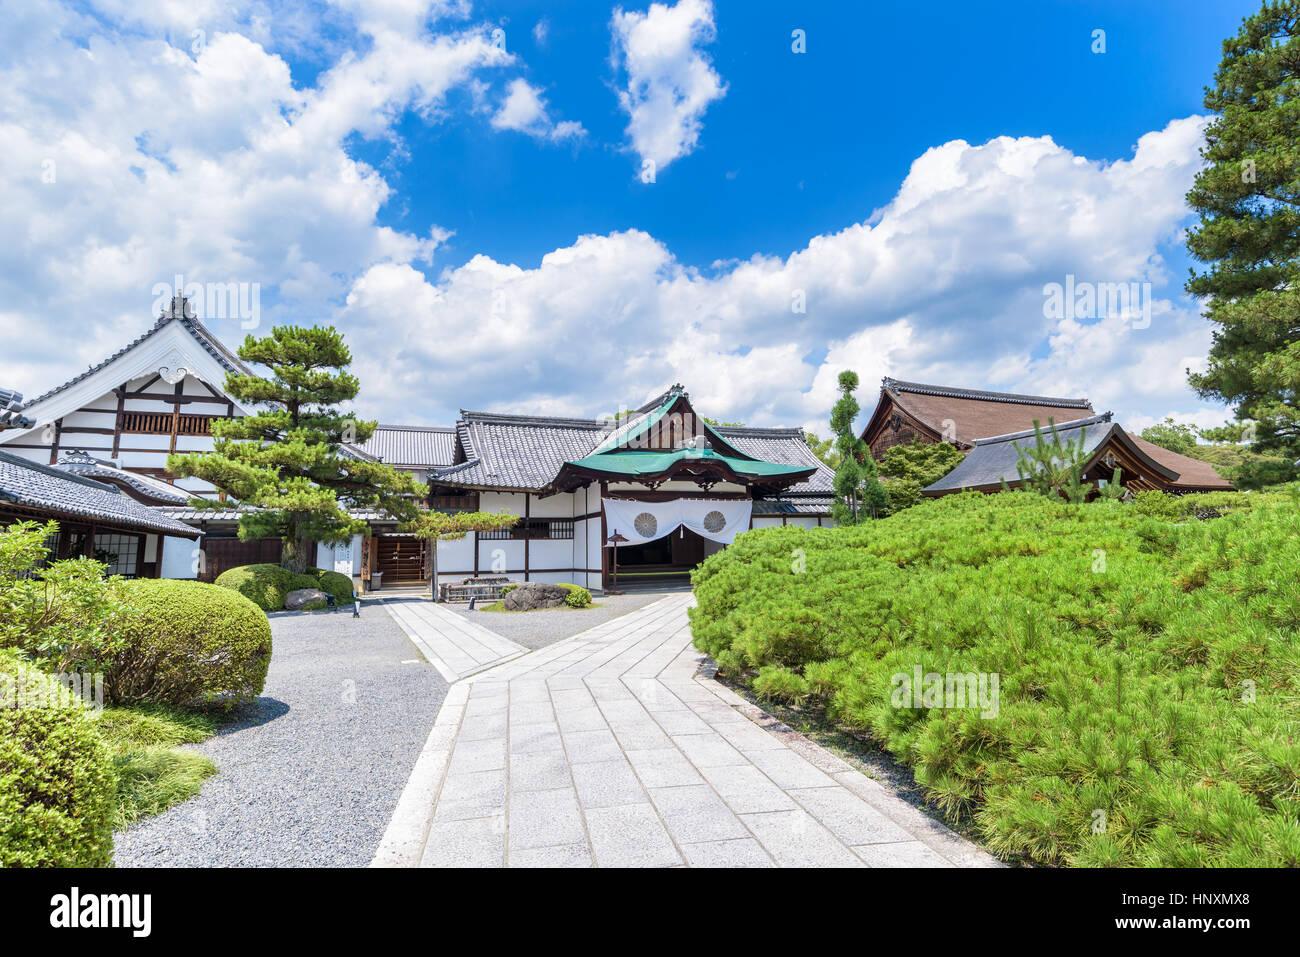 Daikaku-ji temple in Sagano, Kyoto Japan Stock Photo